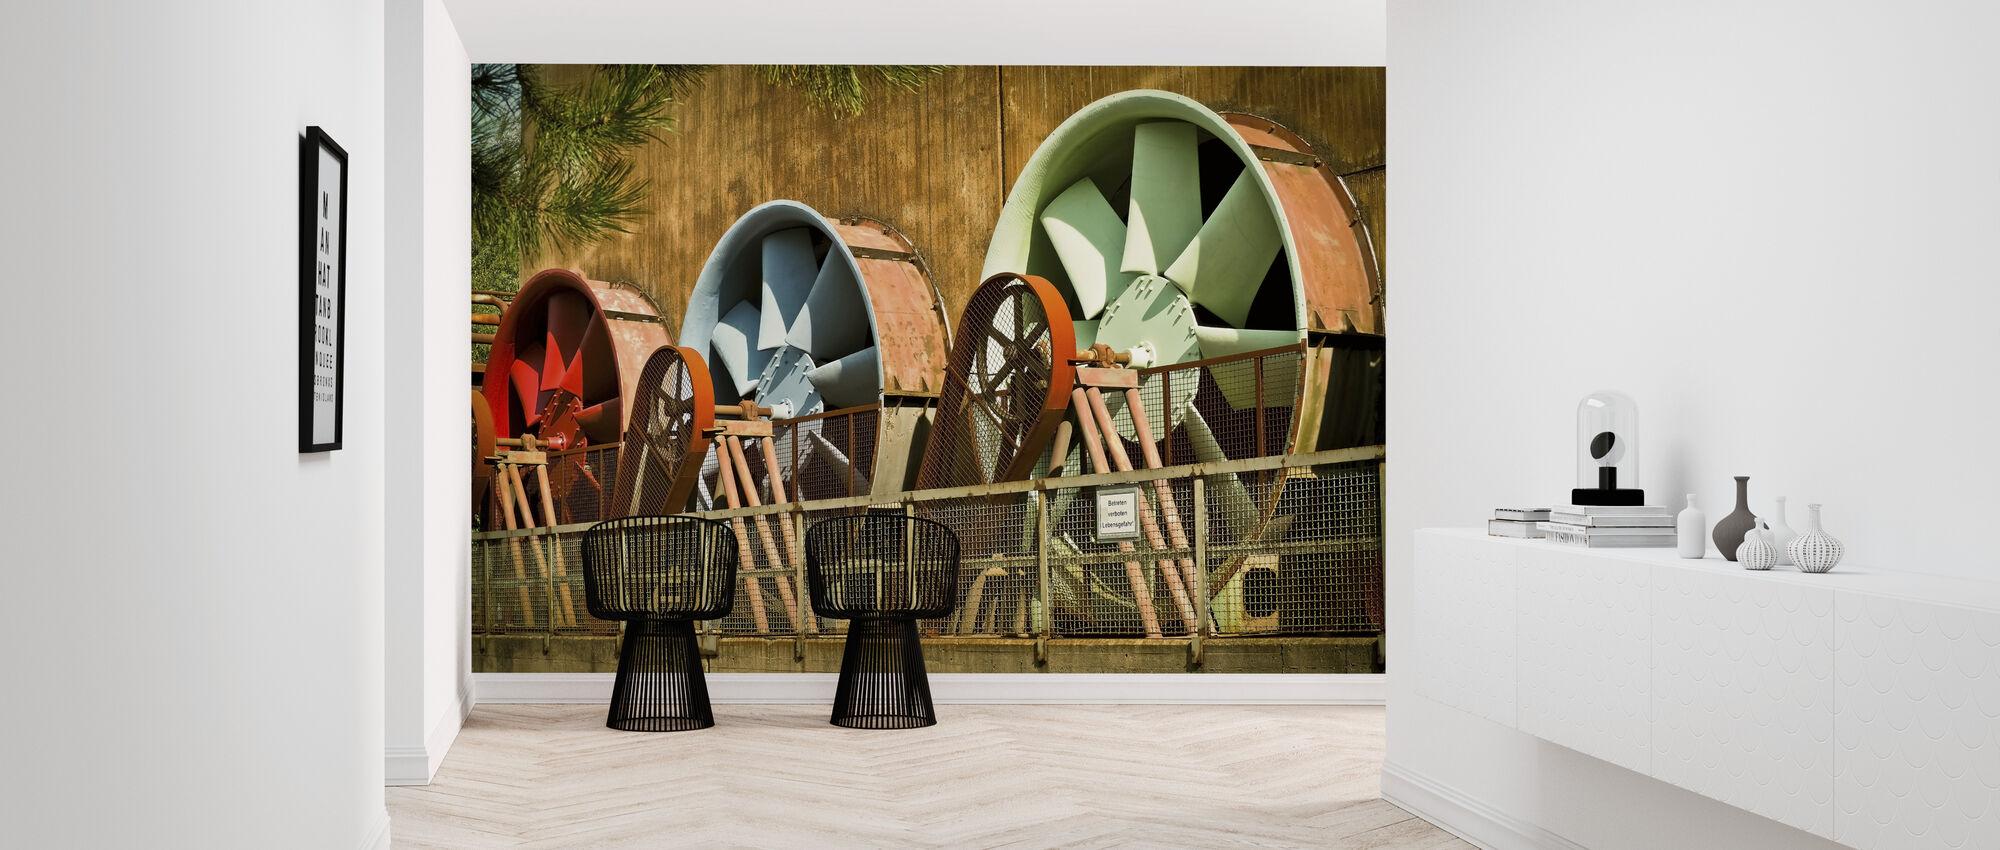 Power Plant Turbines - Wallpaper - Hallway